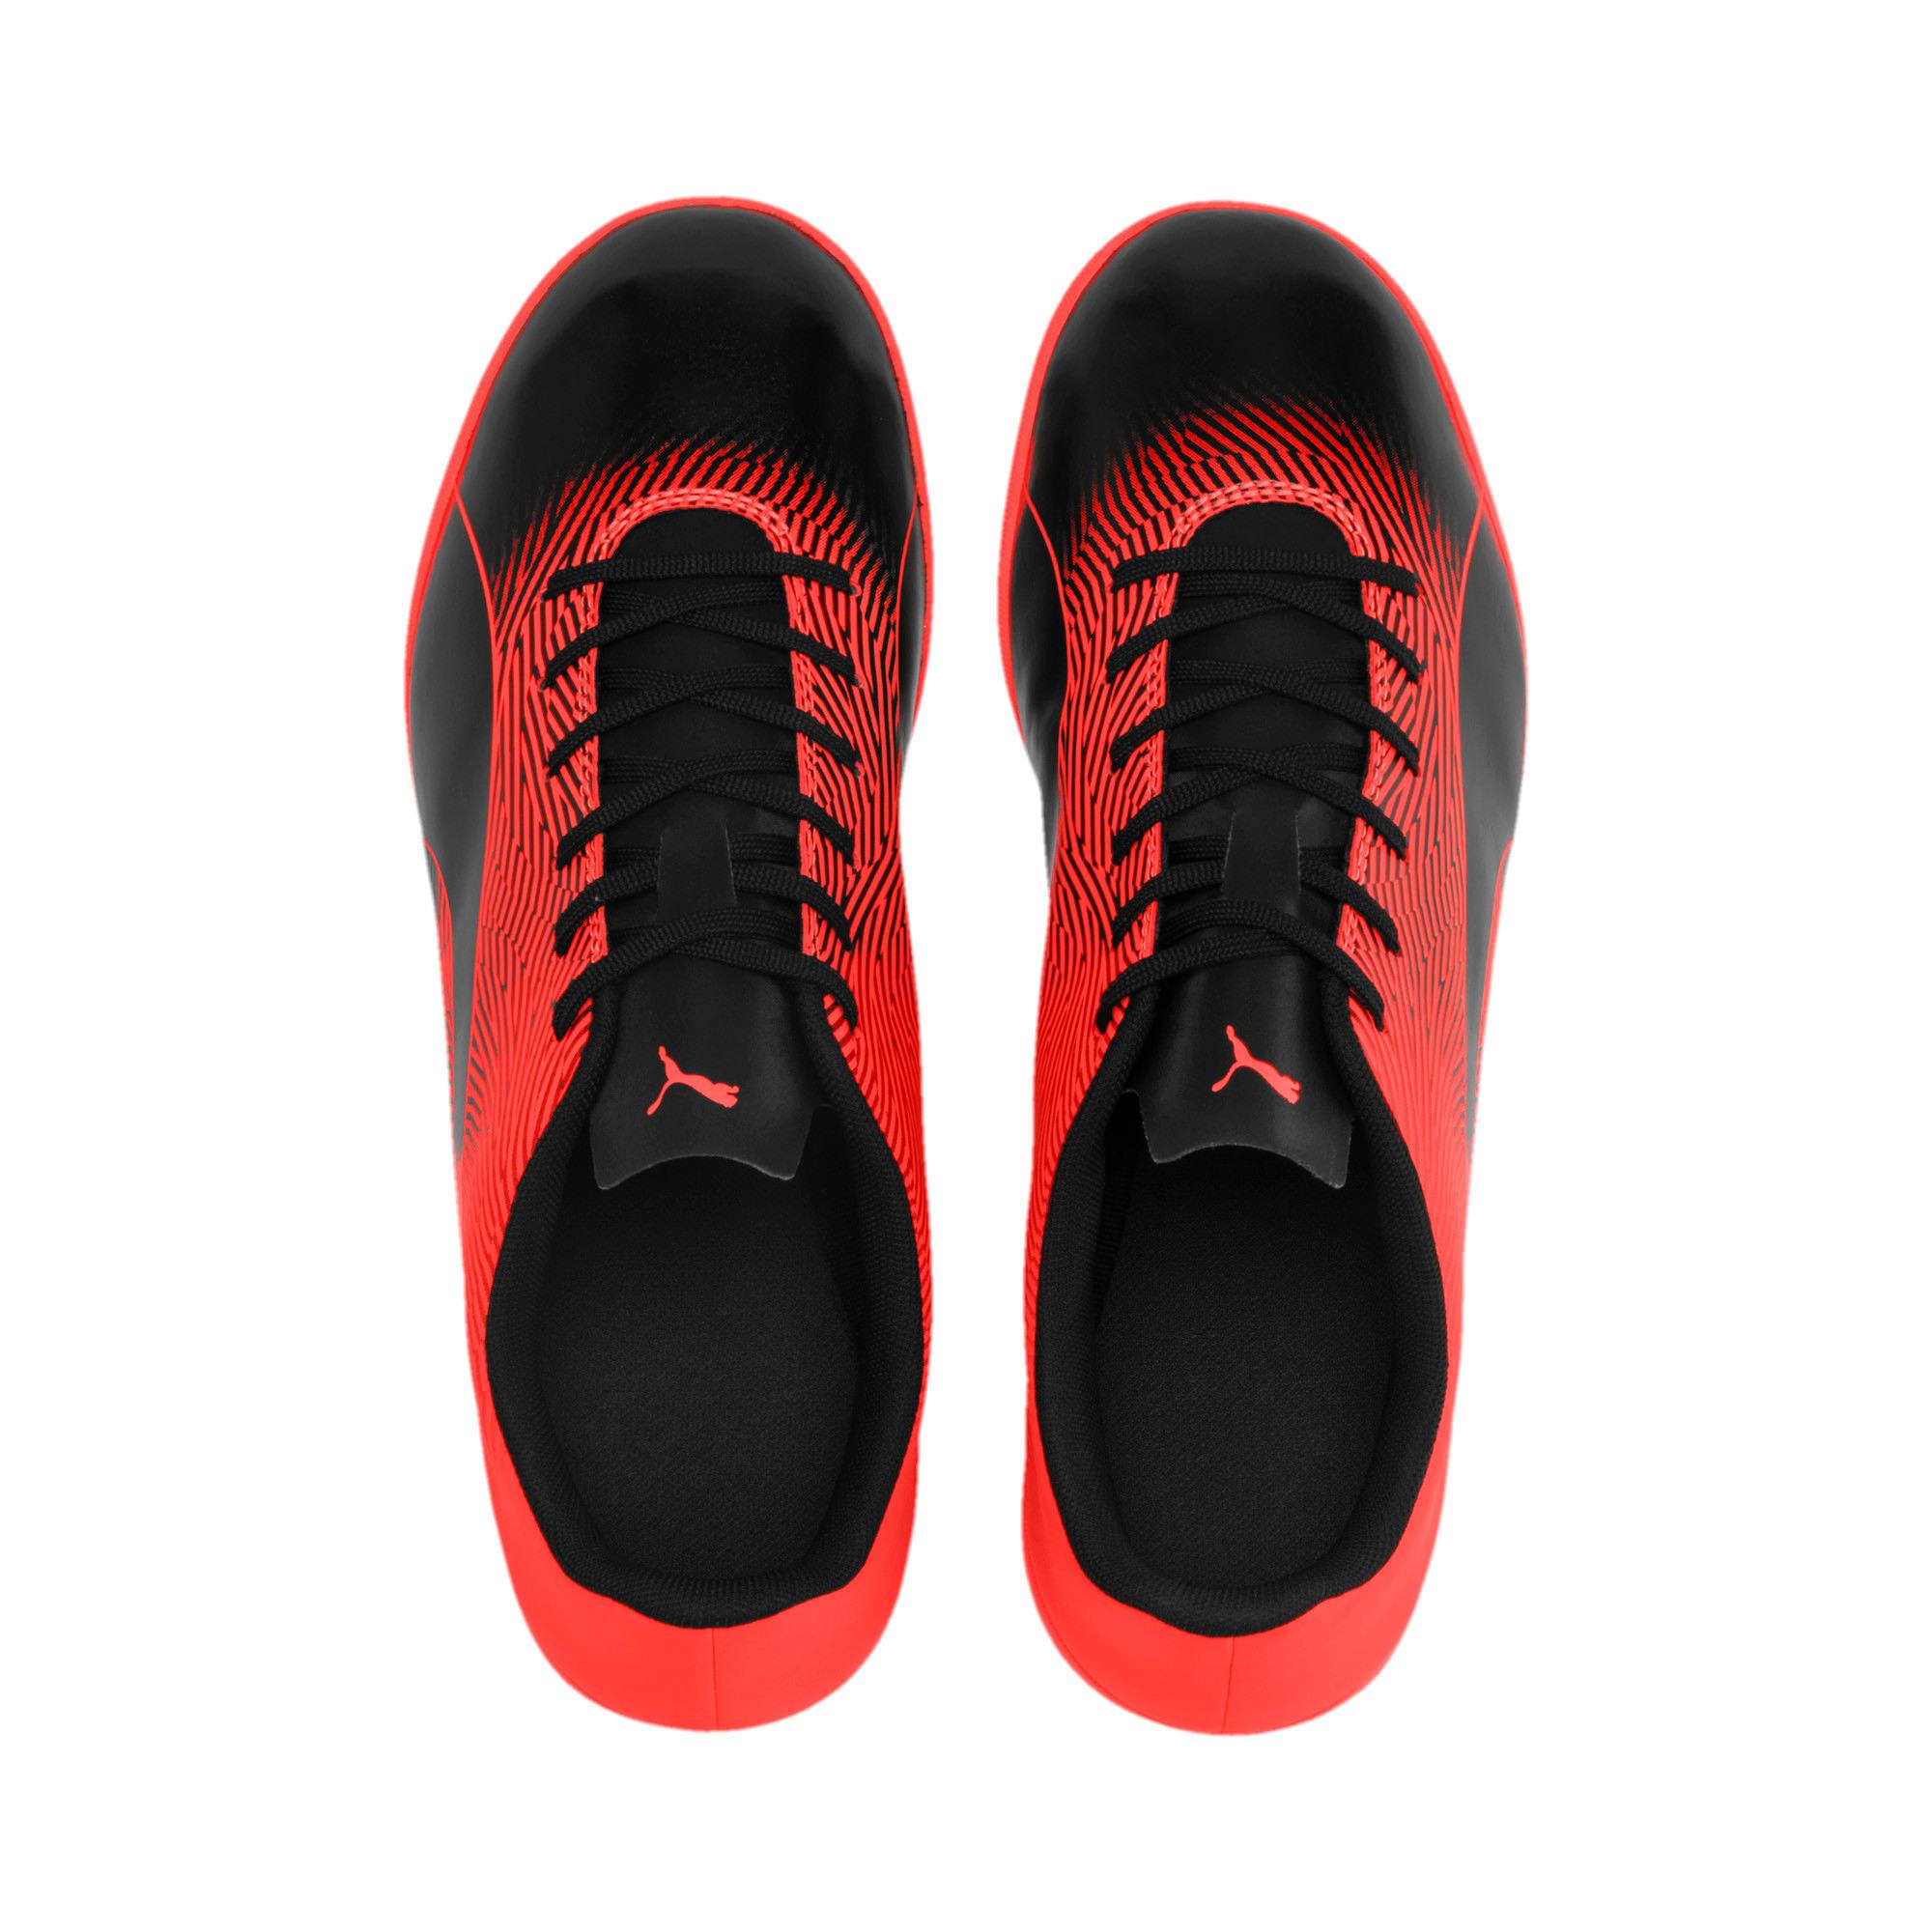 Thumbnail 7 of PUMA Spirit II IT Men's Football Boots, Puma Black-Nrgy Red, medium-IND